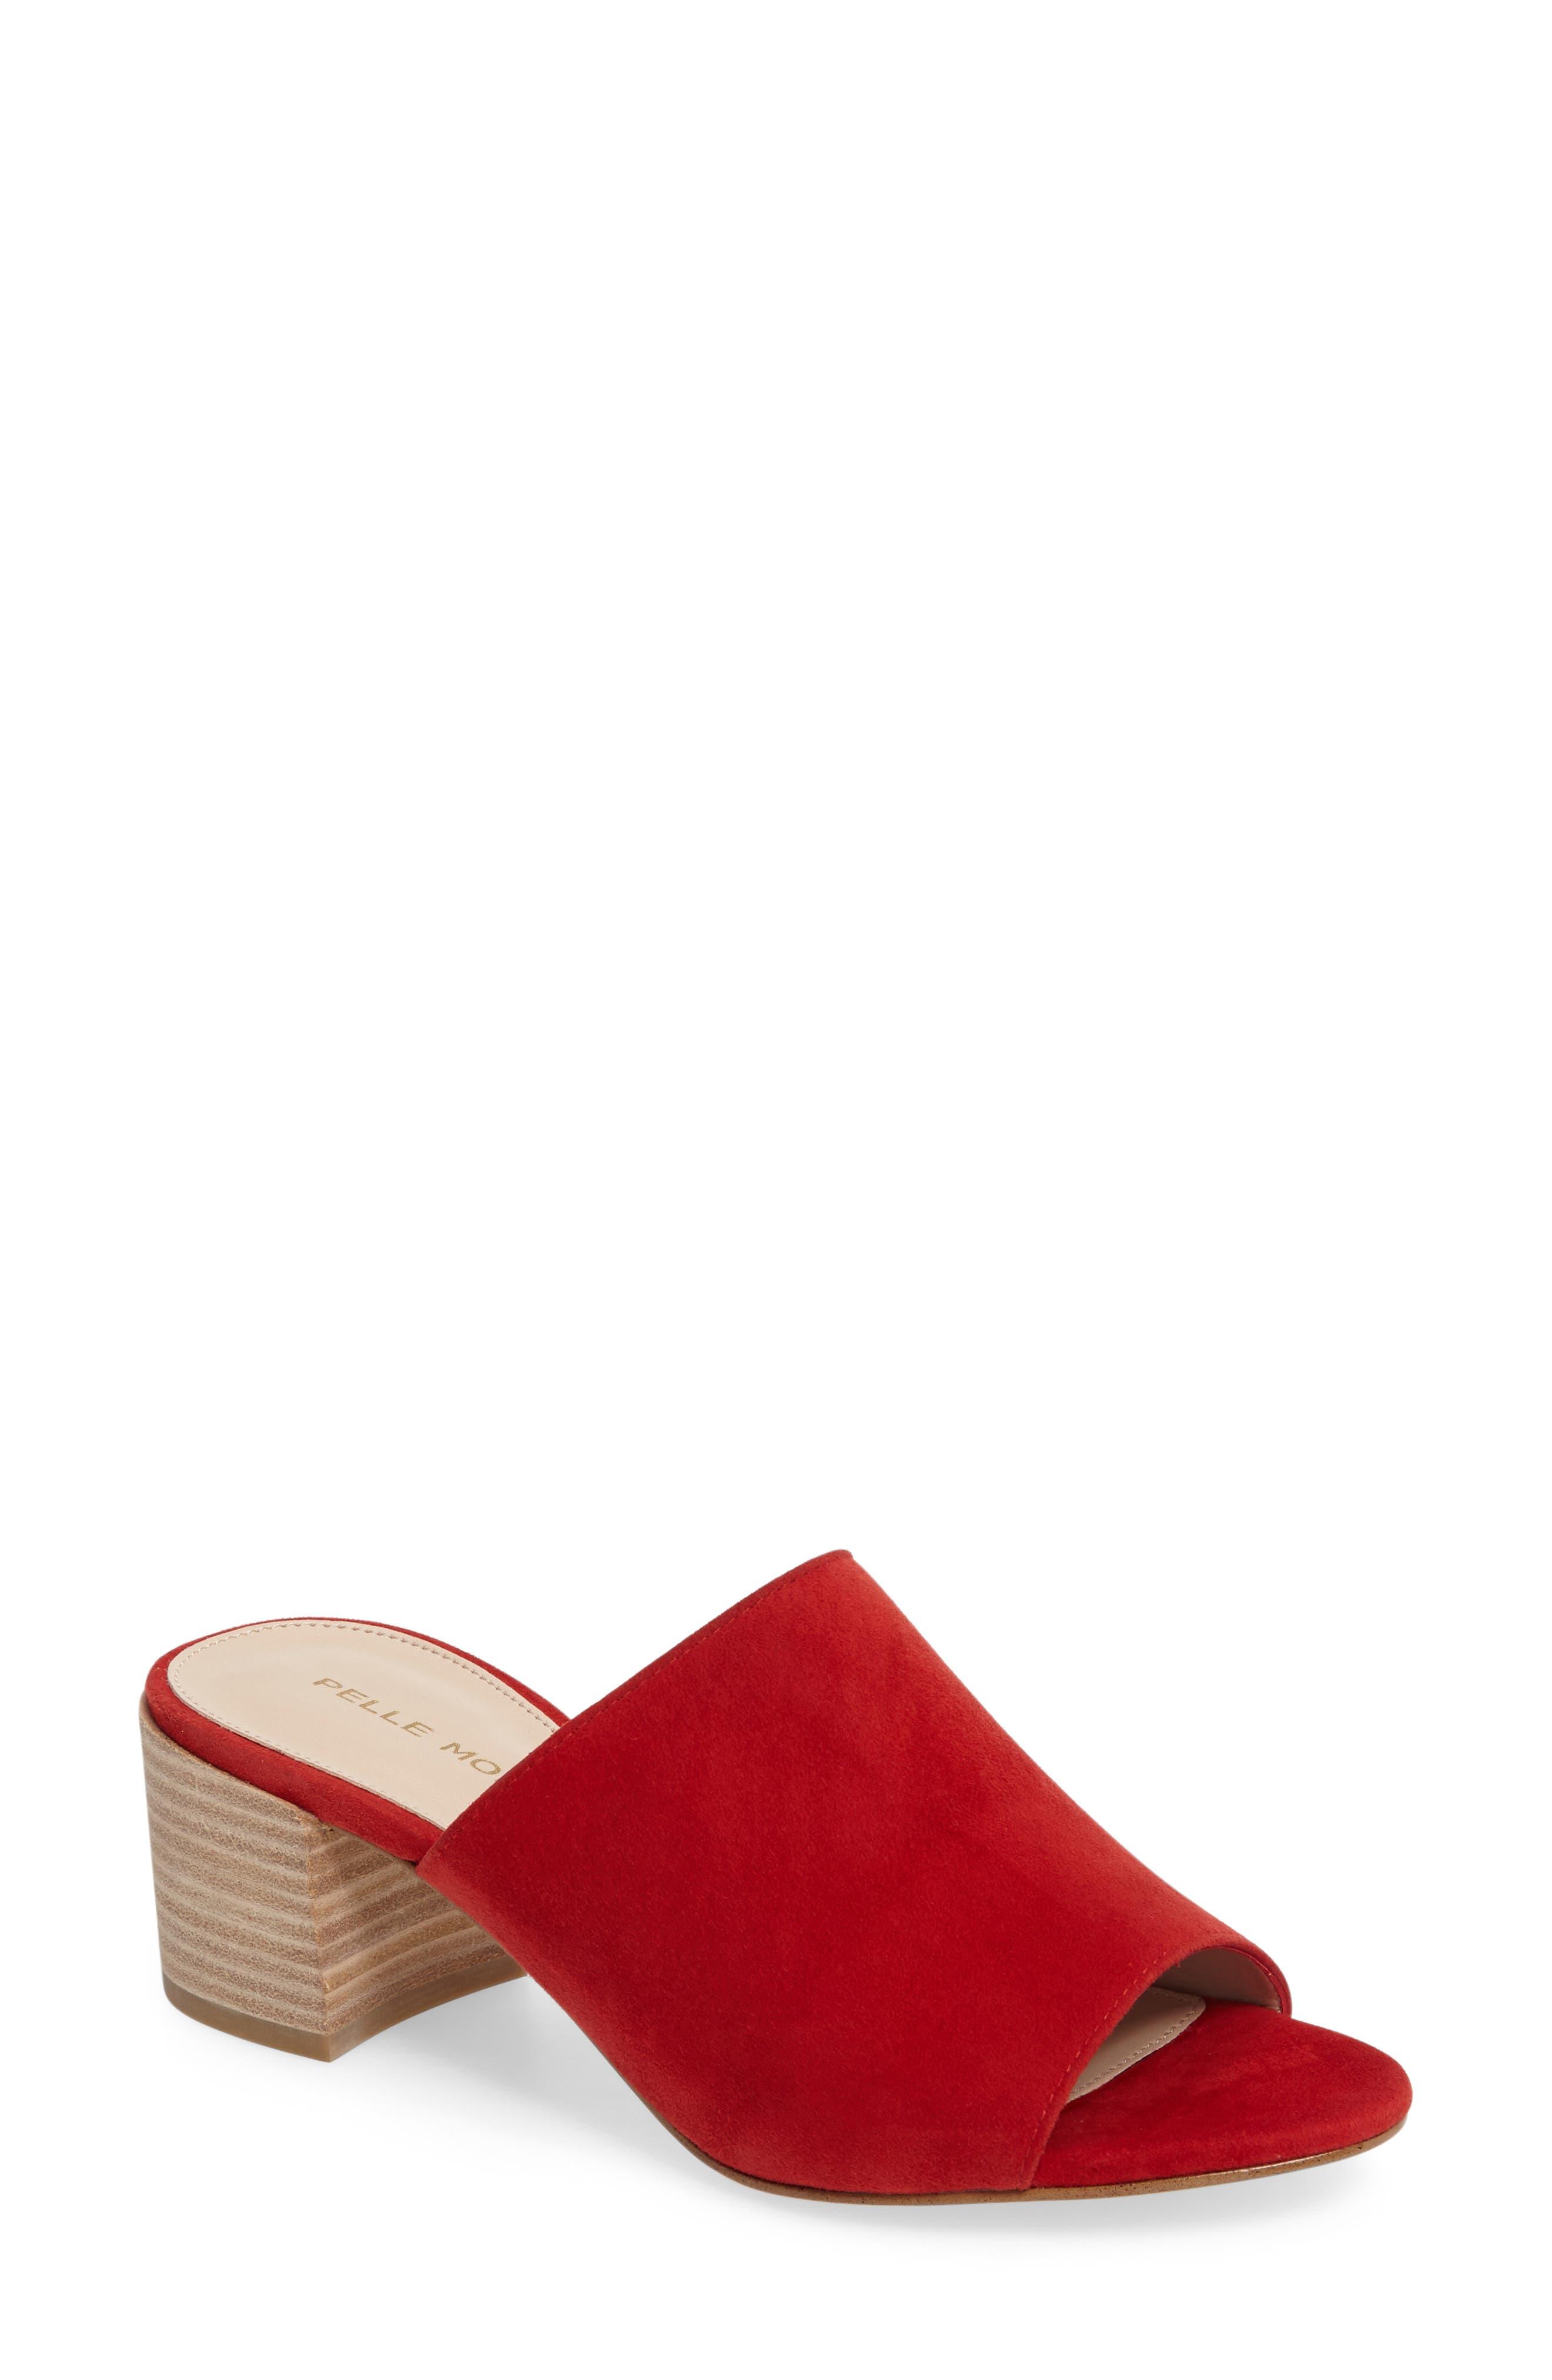 Alternate Image 1 Selected - Pelle Moda Union Block Heel Mule (Women)